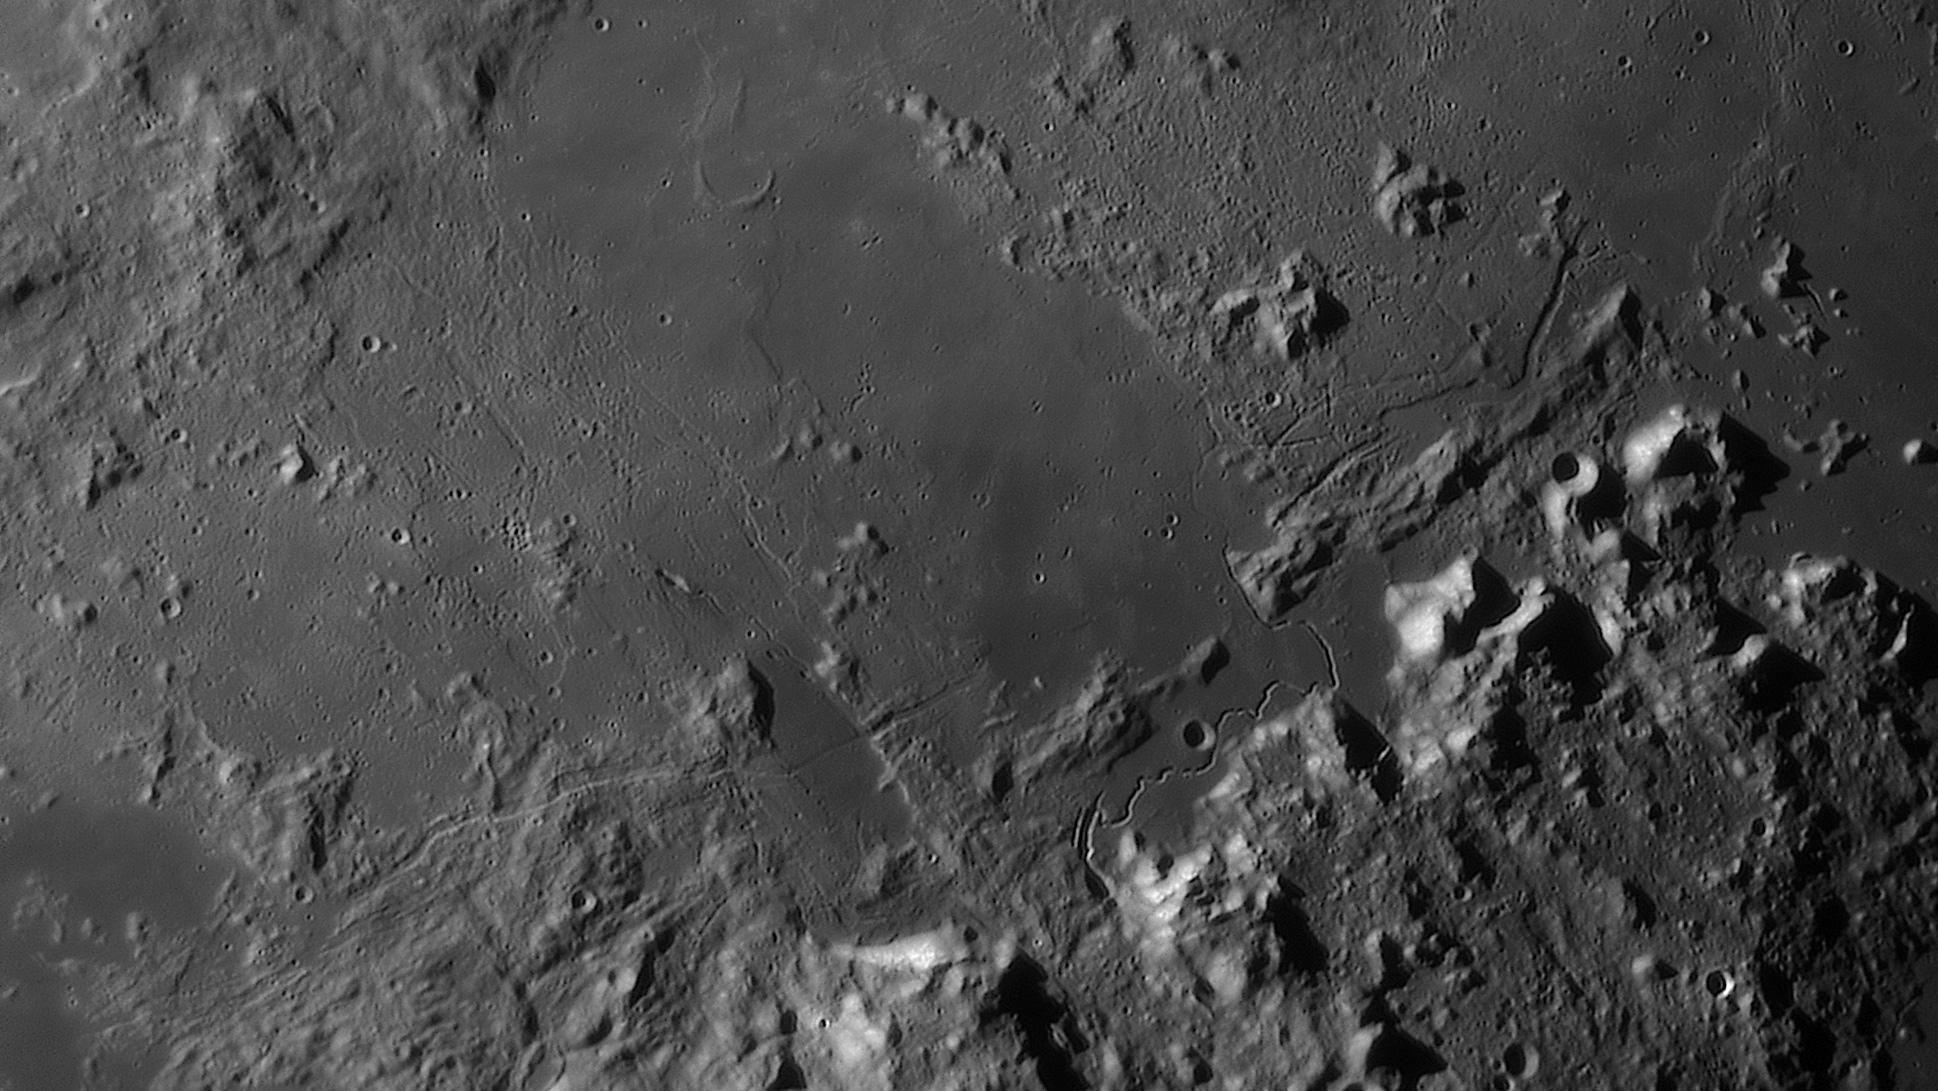 large.moon_23_07_2019_04_04_08_HADLEY.jpg.90a2f42575d925b1219334c2846907fe.jpg